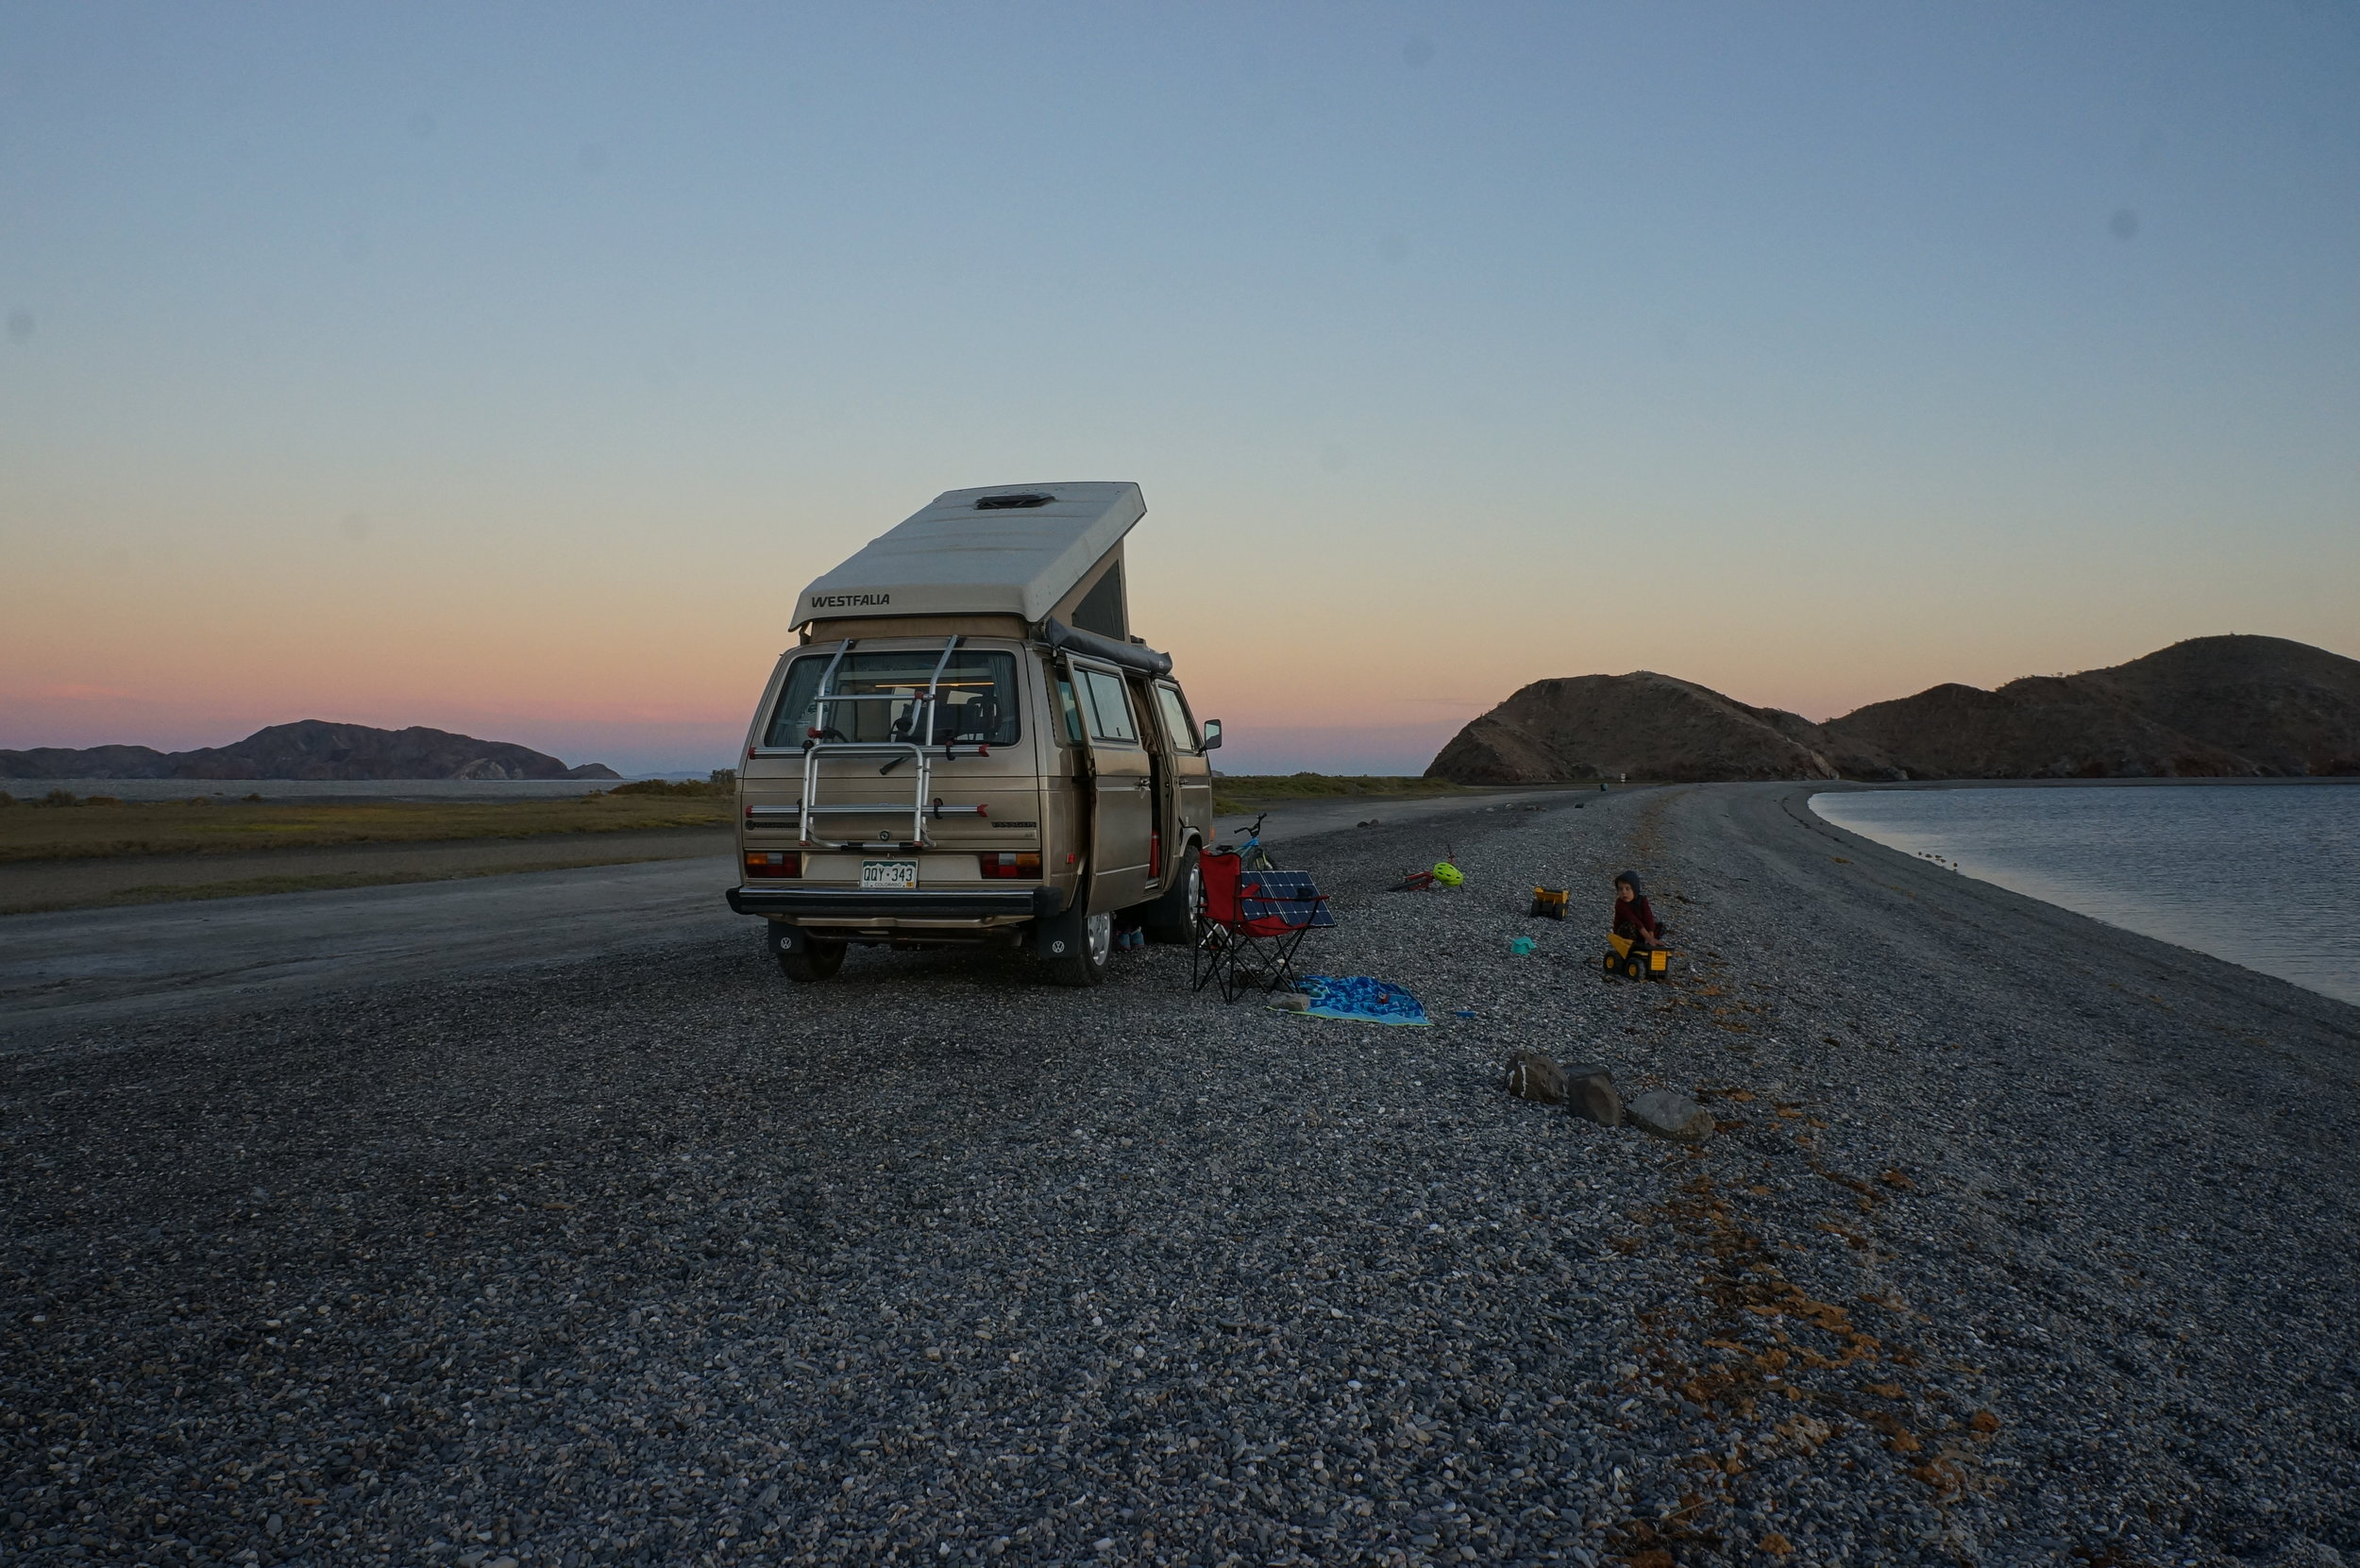 Back in Baja where opportunity awaits...